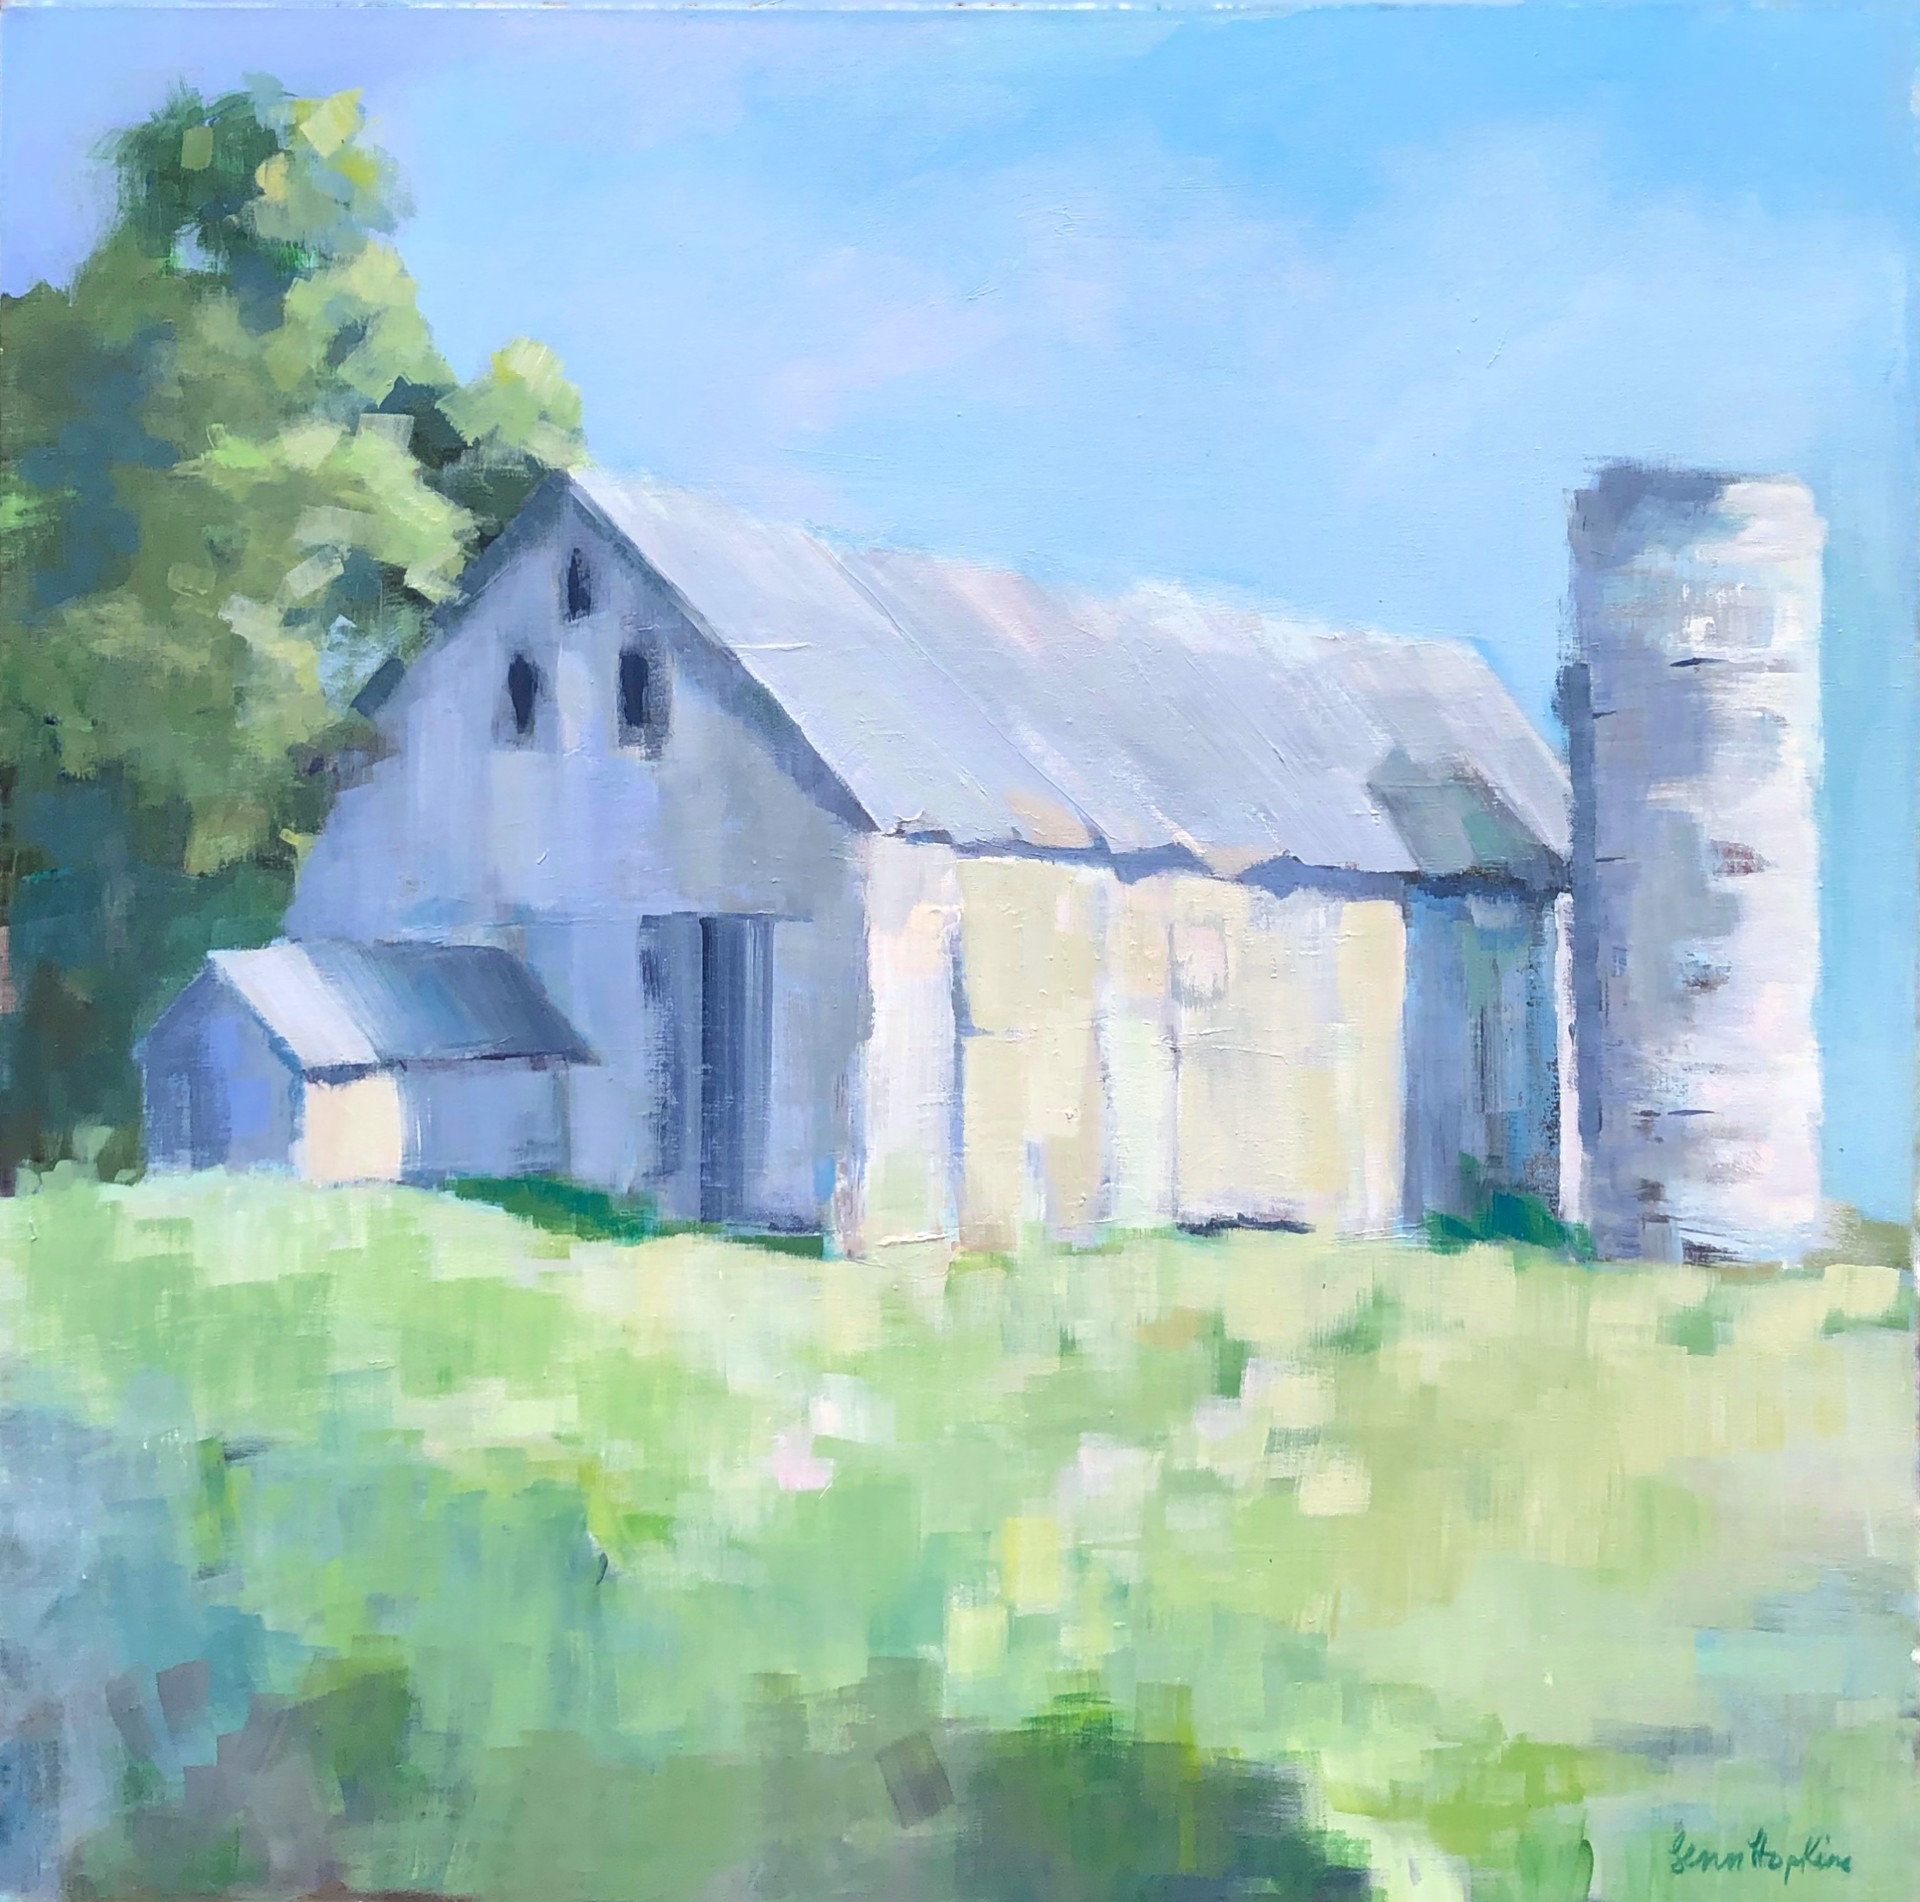 North Georgia White Barn by Lenn Hopkins